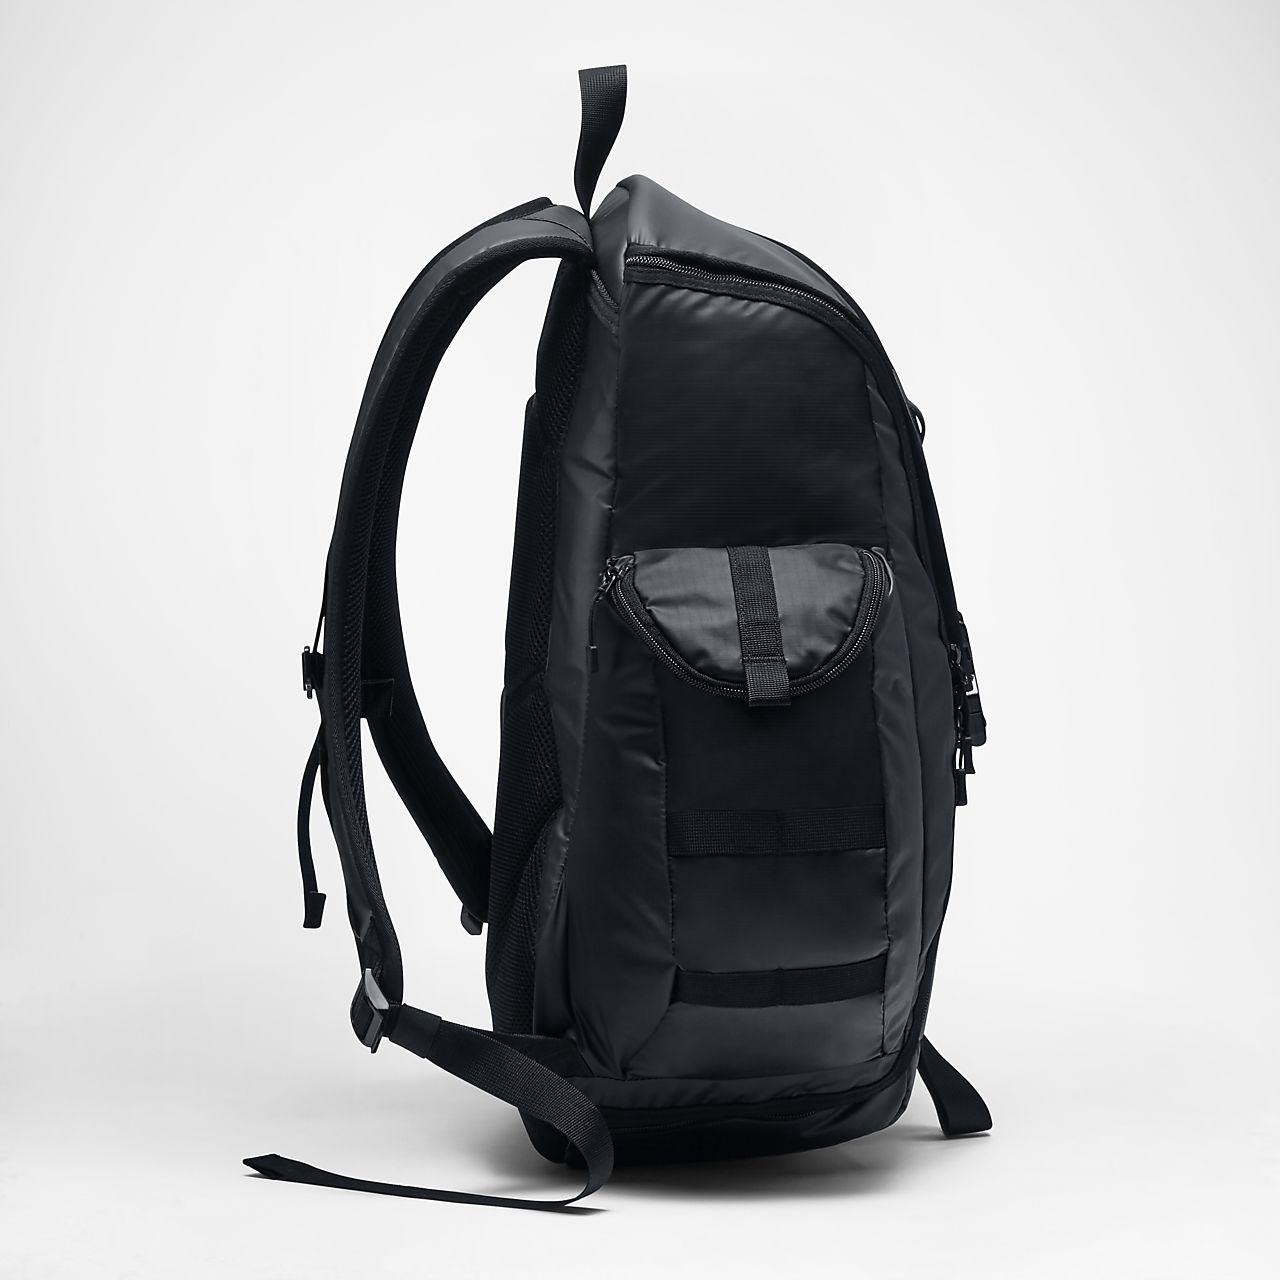 f8628b3a7d98 Low Resolution Nike Cheyenne Responder Backpack Nike Cheyenne Responder  Backpack